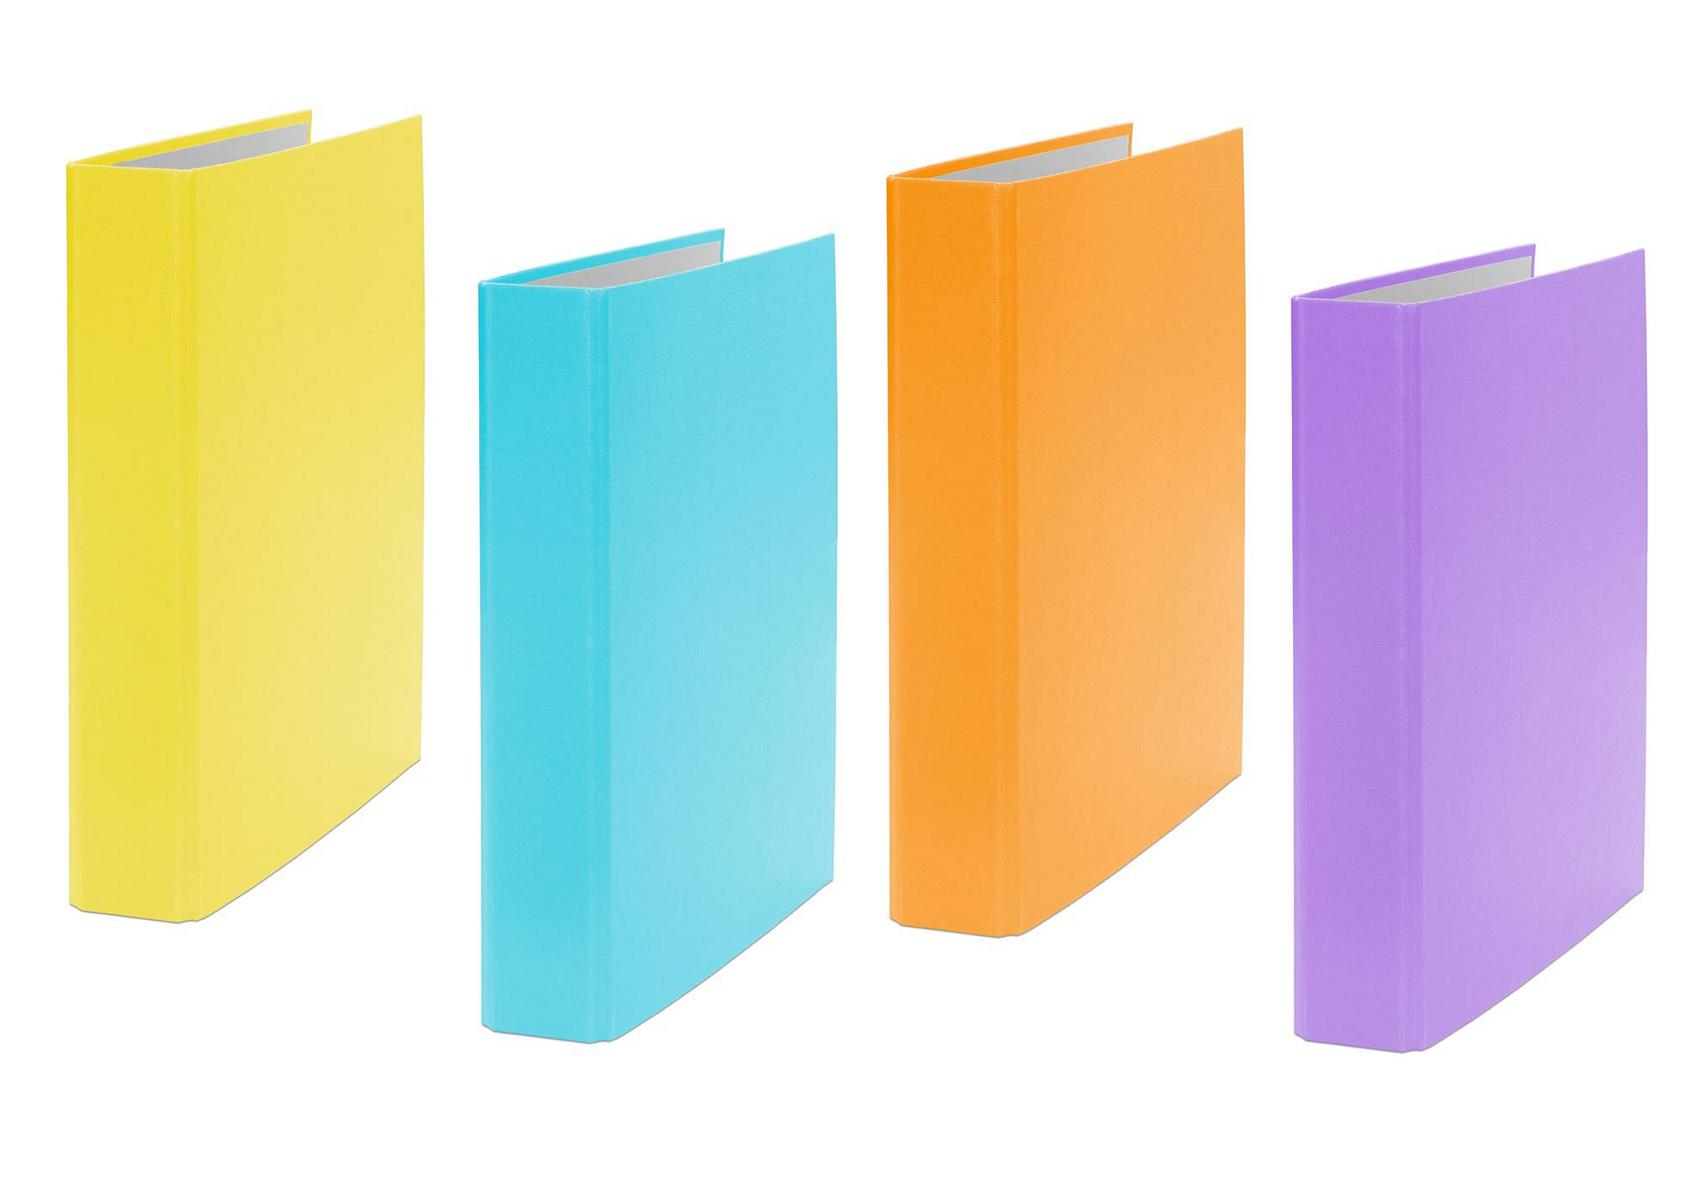 livepac office 4x ringbuch din a5 2 ring ordner je 1x orange gelb t rkis und lila. Black Bedroom Furniture Sets. Home Design Ideas